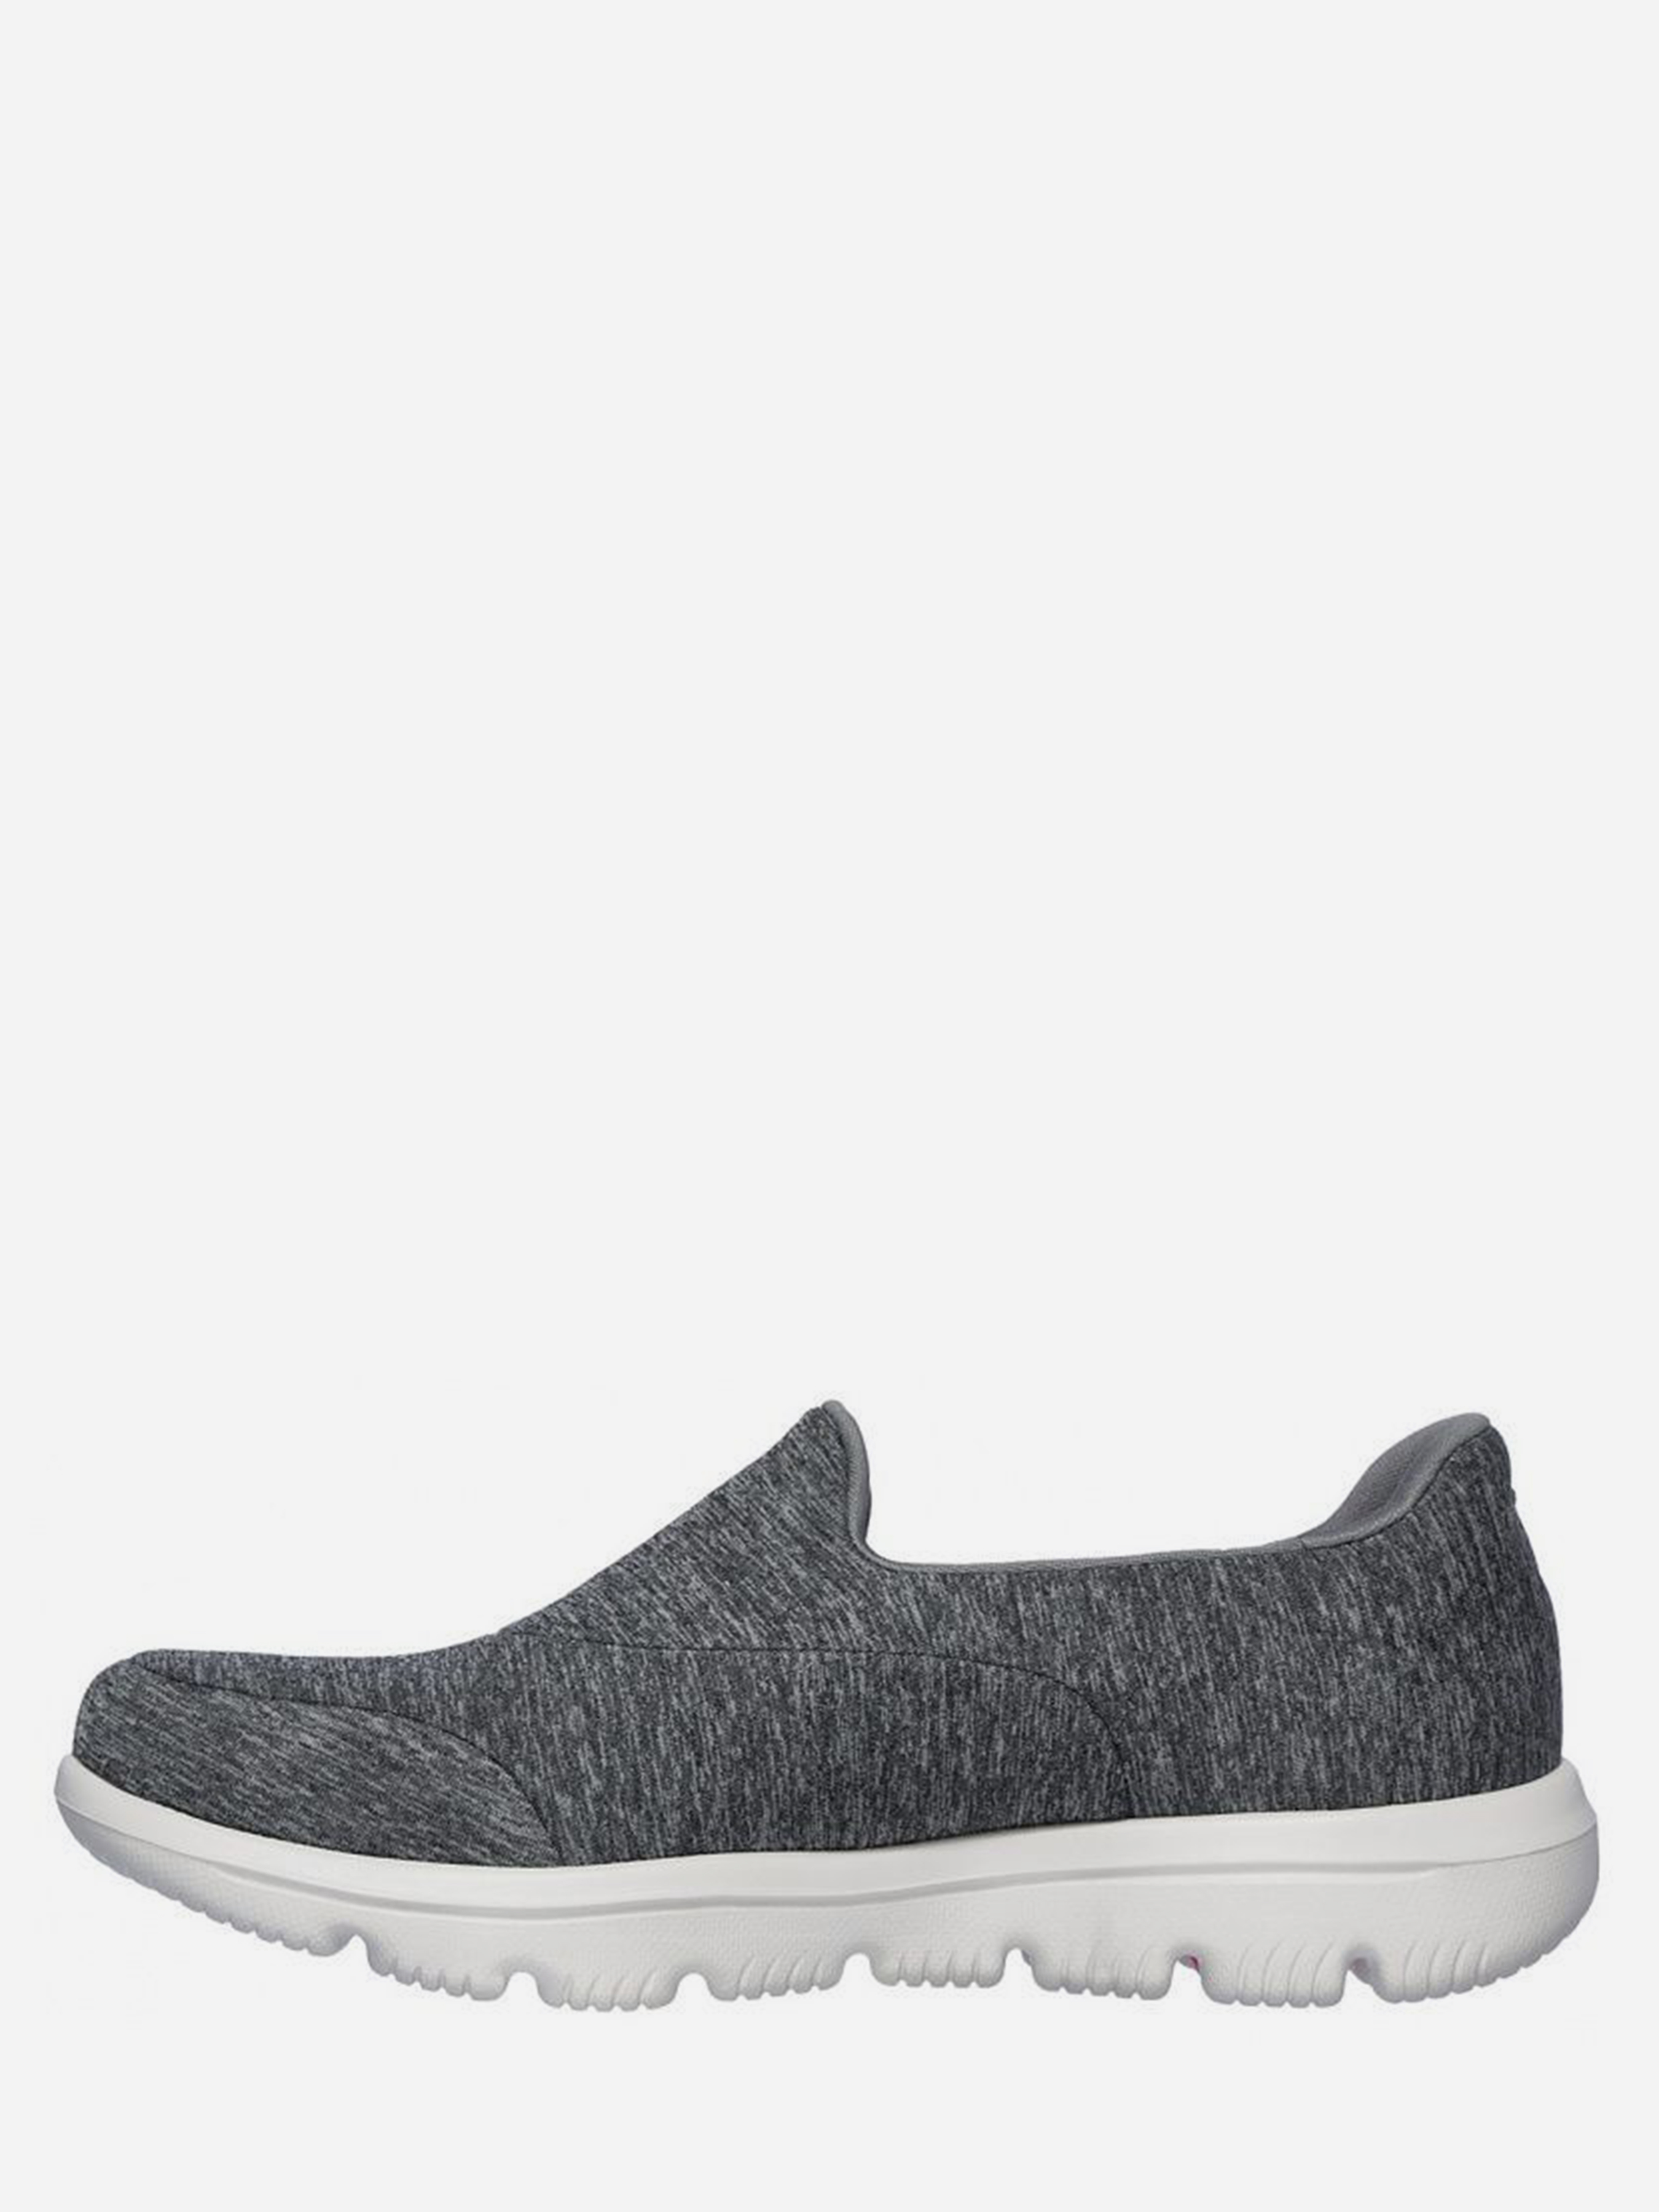 Cлипоны для женщин Skechers KW4874 размеры обуви, 2017